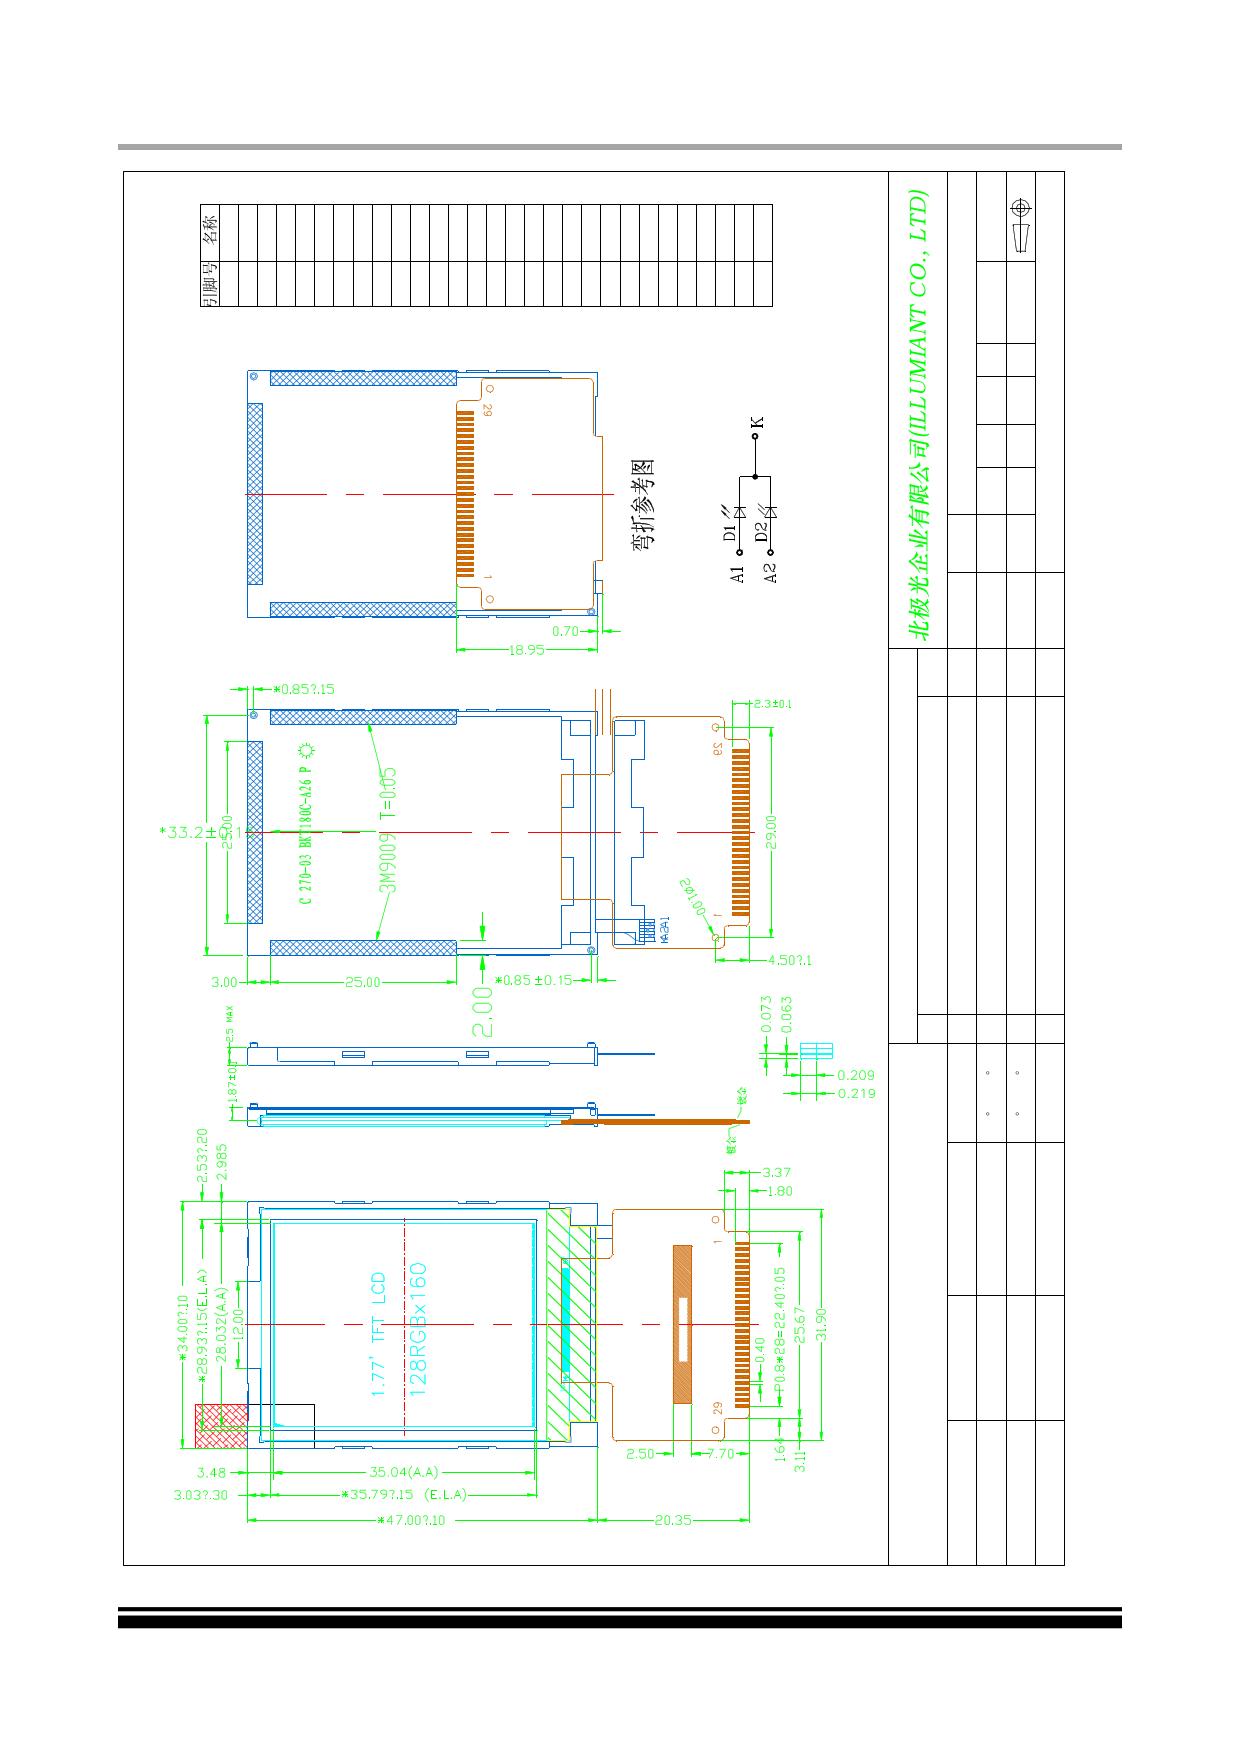 I1813-6IPN1216A pdf